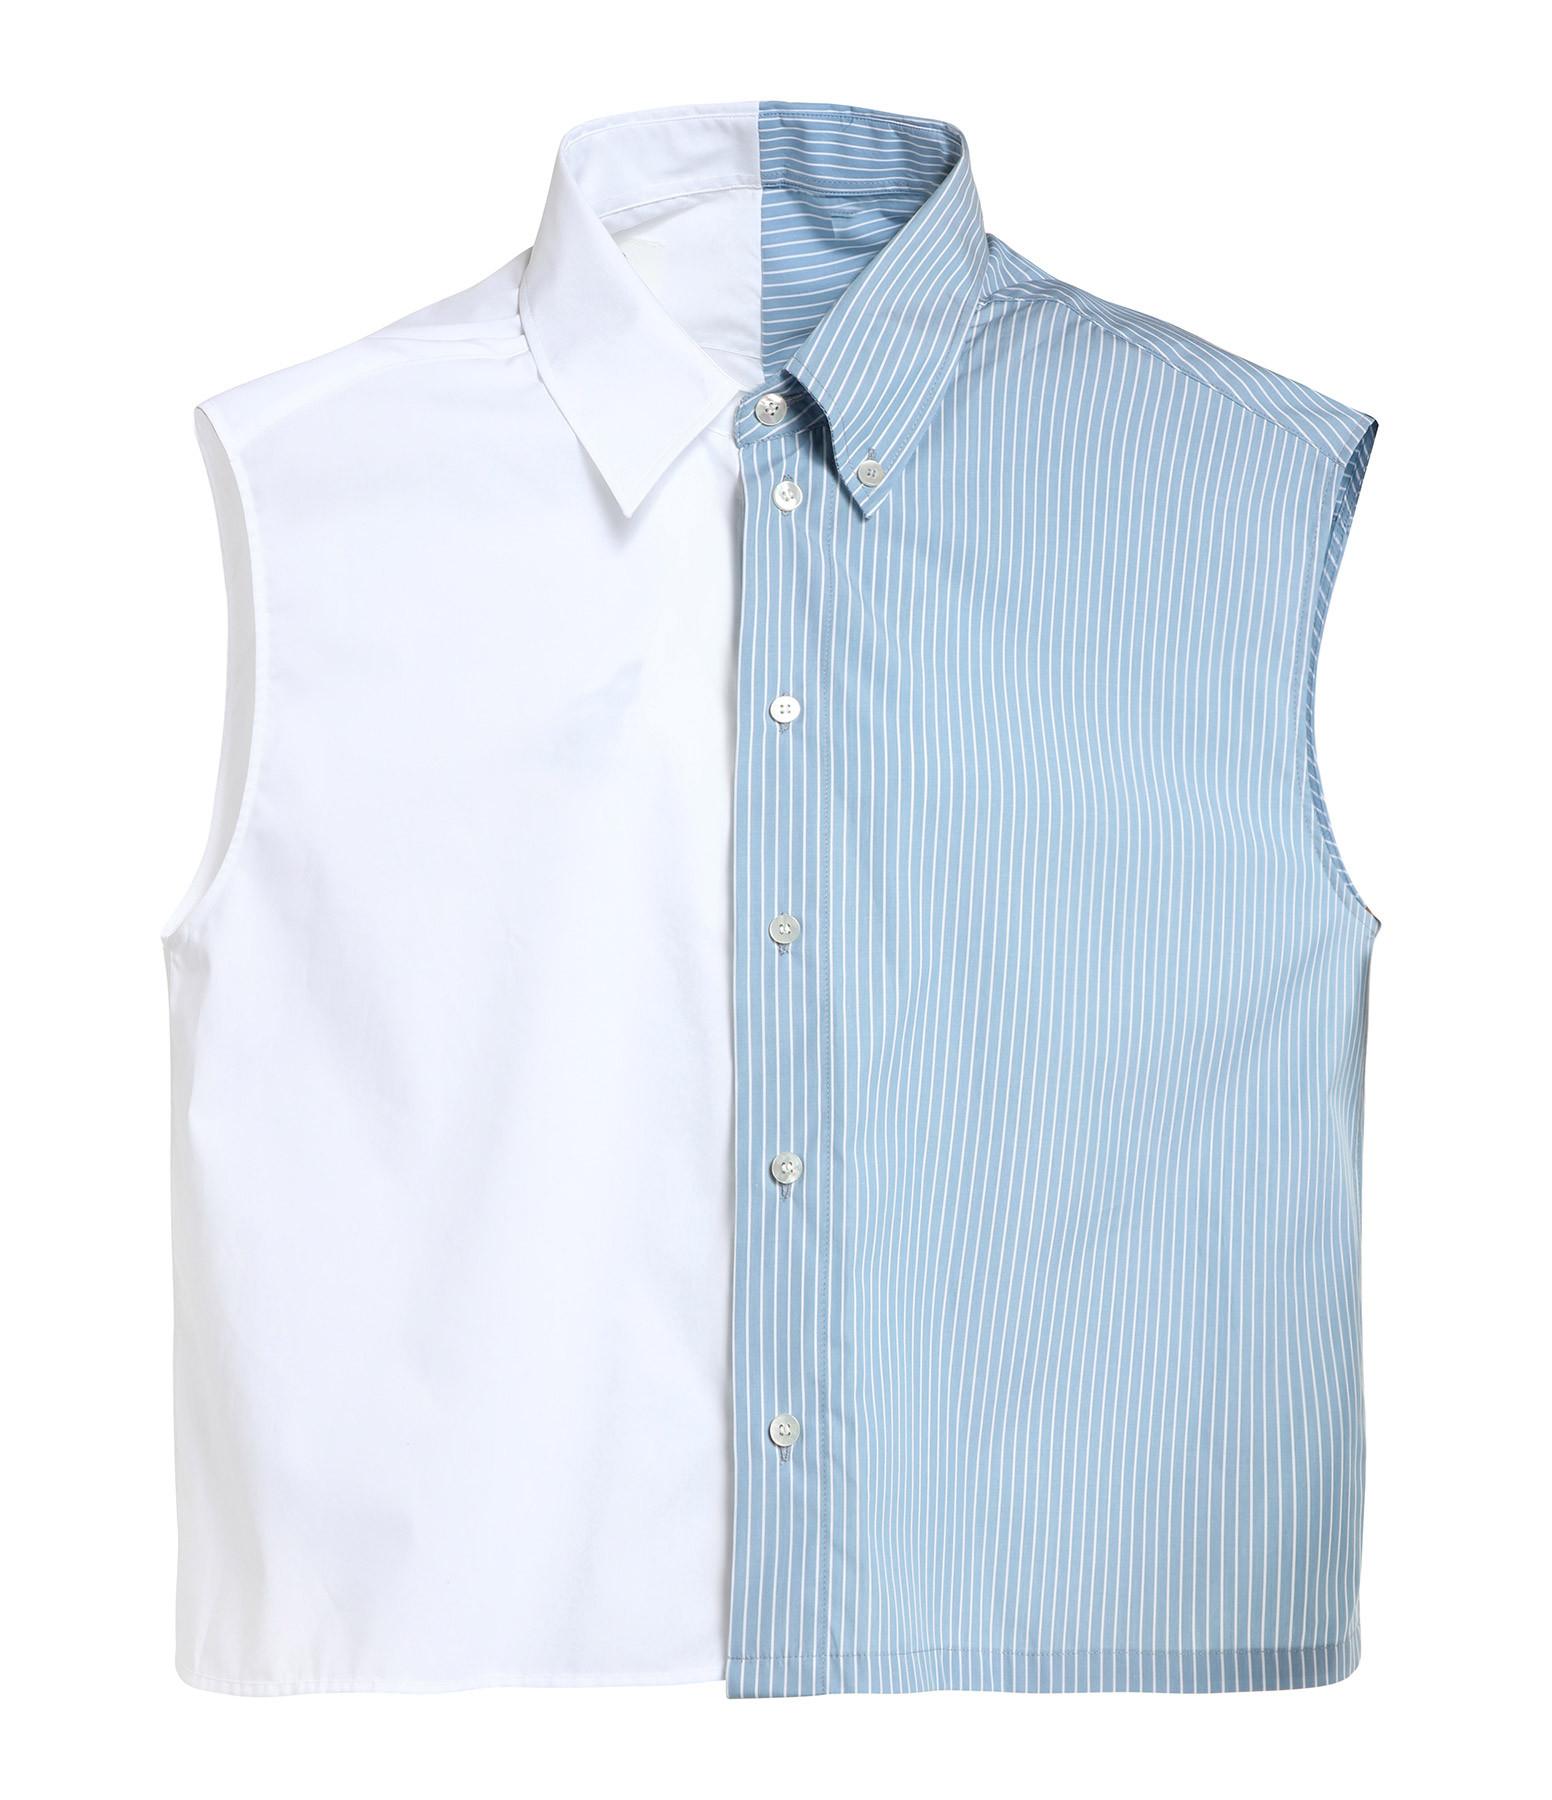 MM6 MAISON MARGIELA - Chemise Volants Dos Rayures Blanc Bleu